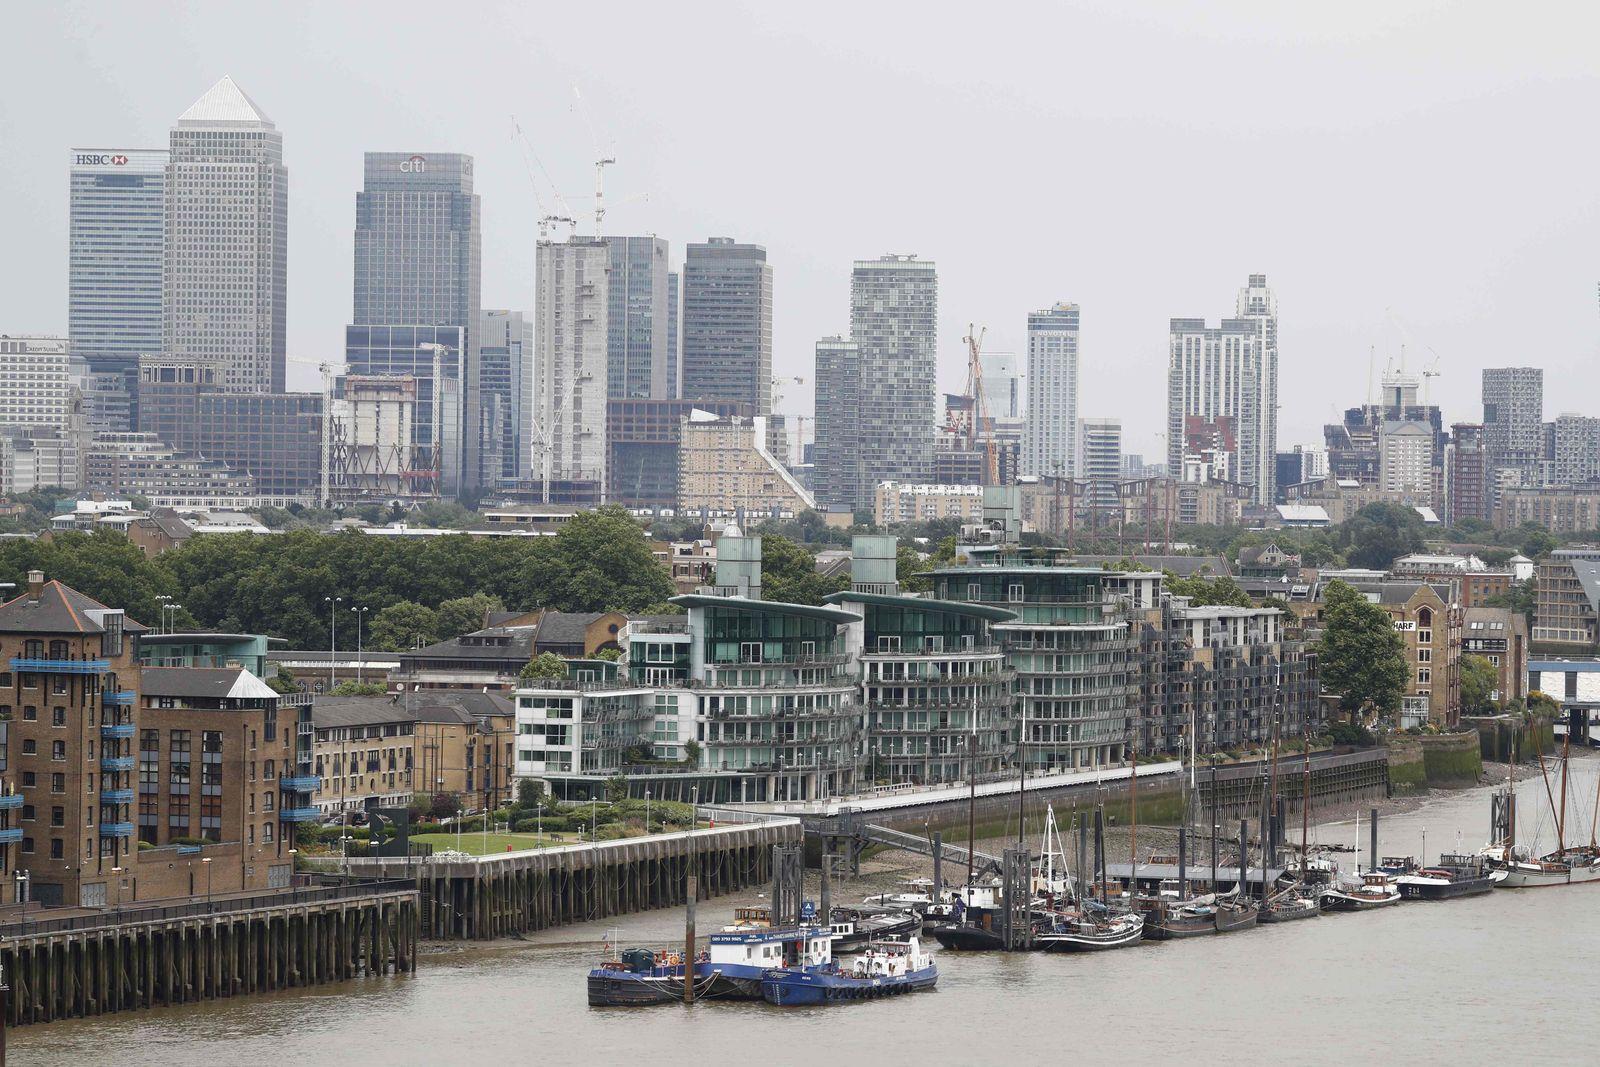 Canary Wharf / London / Brexit